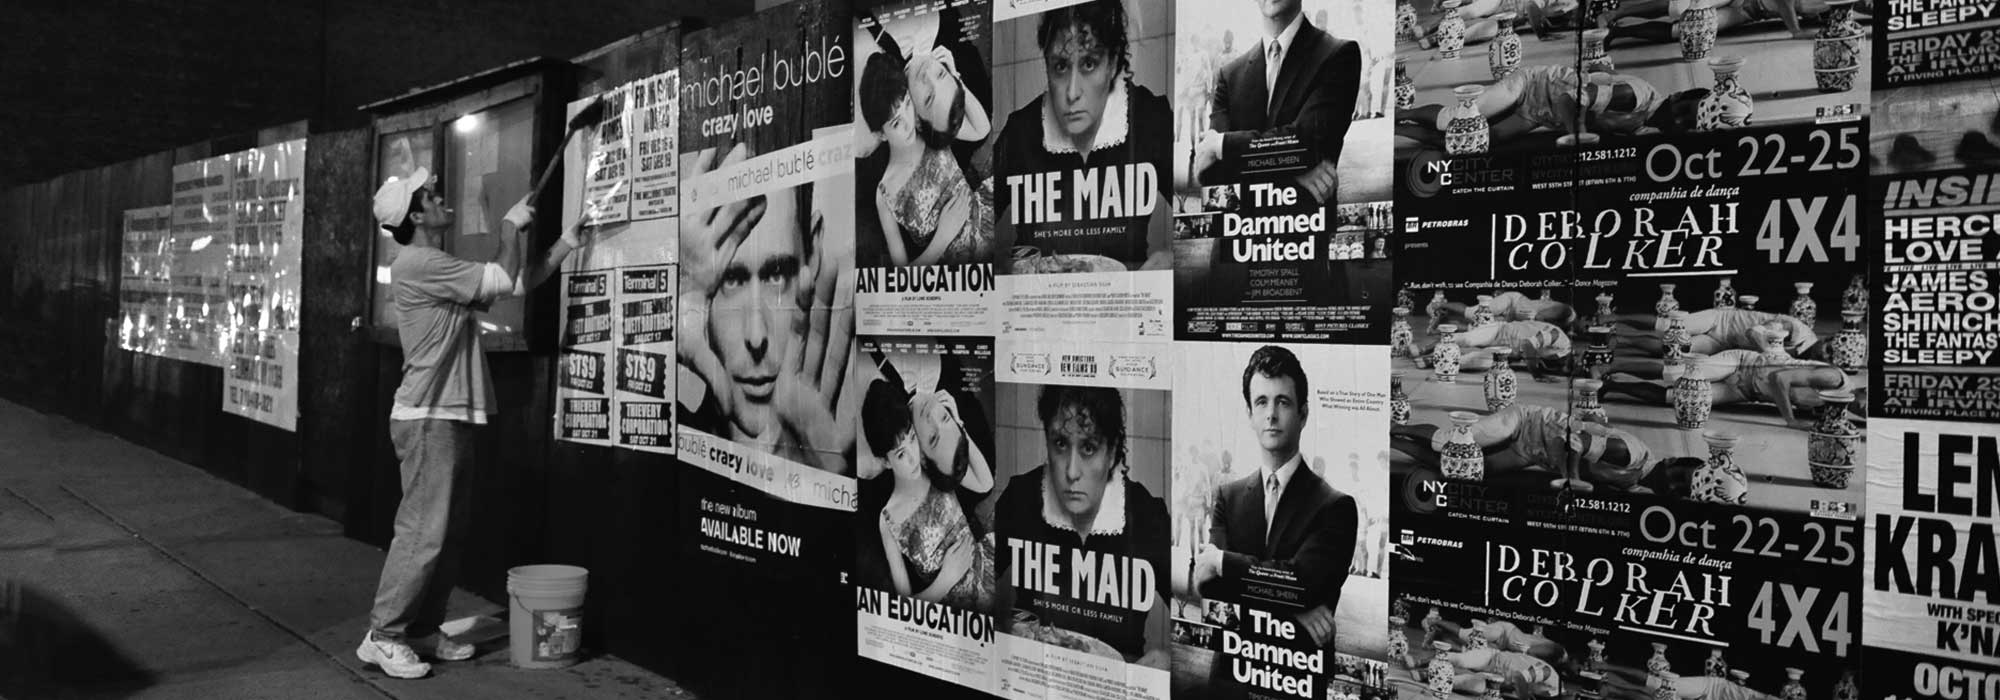 Wild Posting Posters | Printing New York